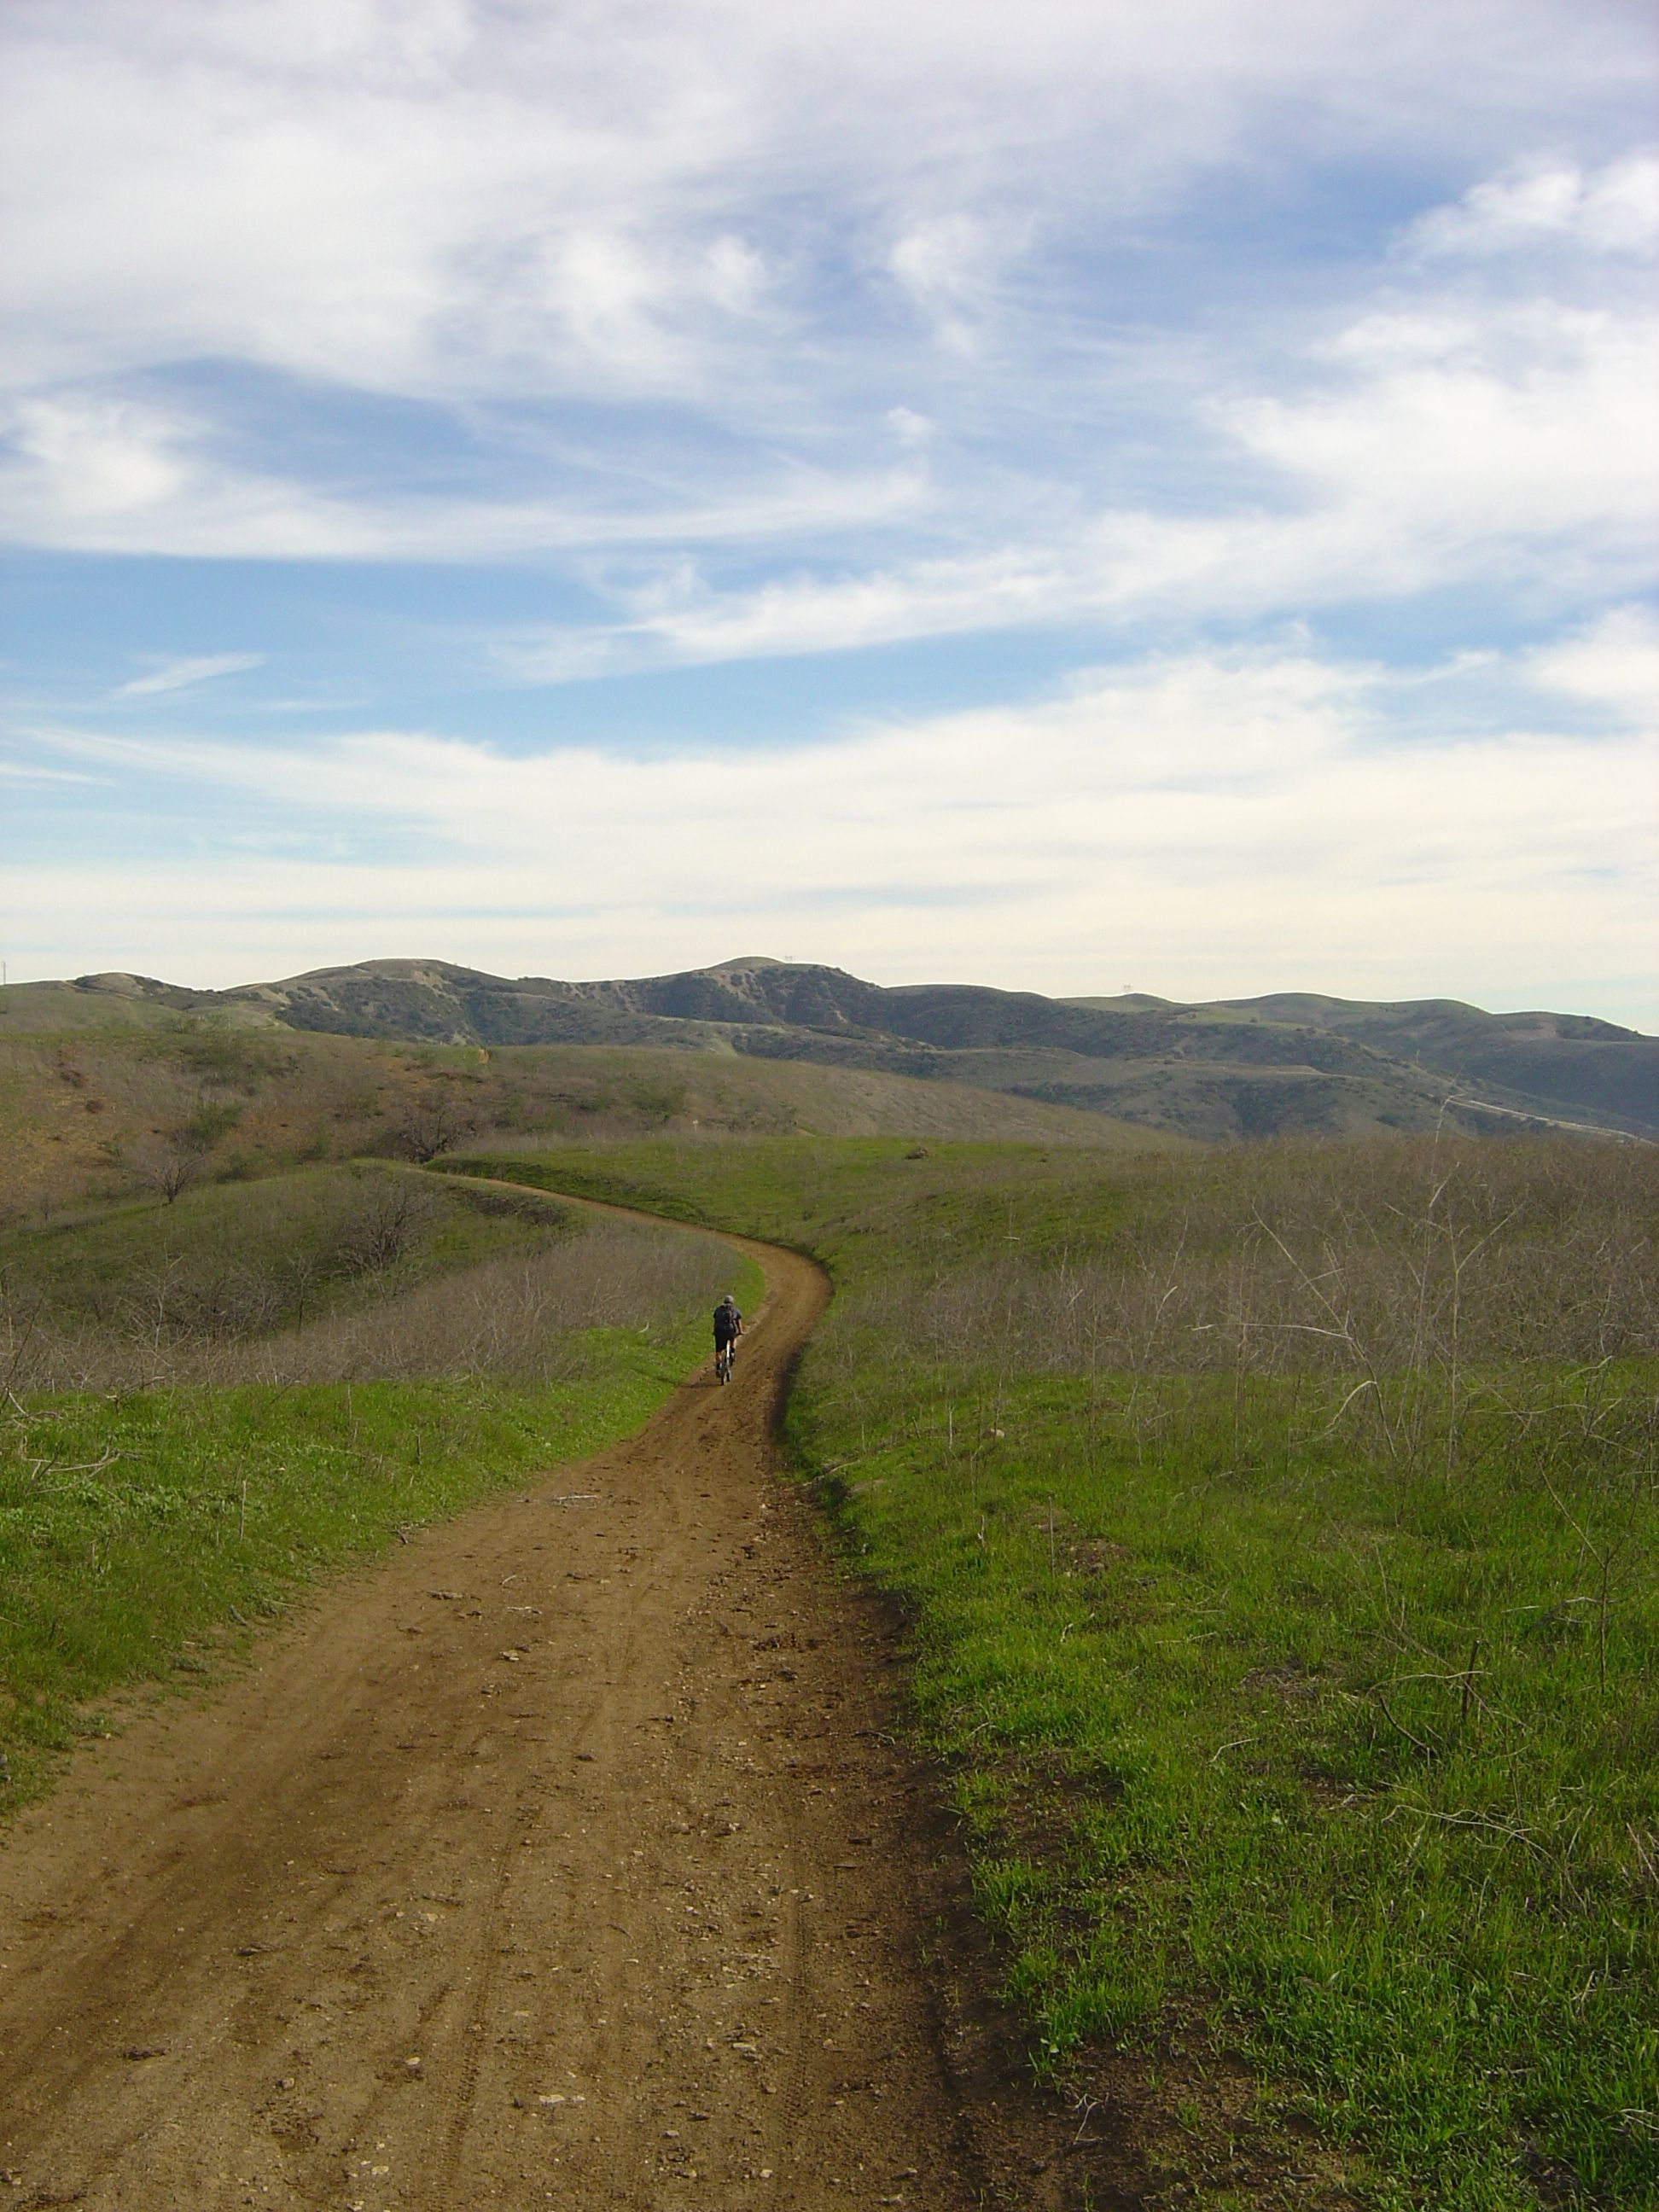 Biking down the path...I think this was Marshall Canyon